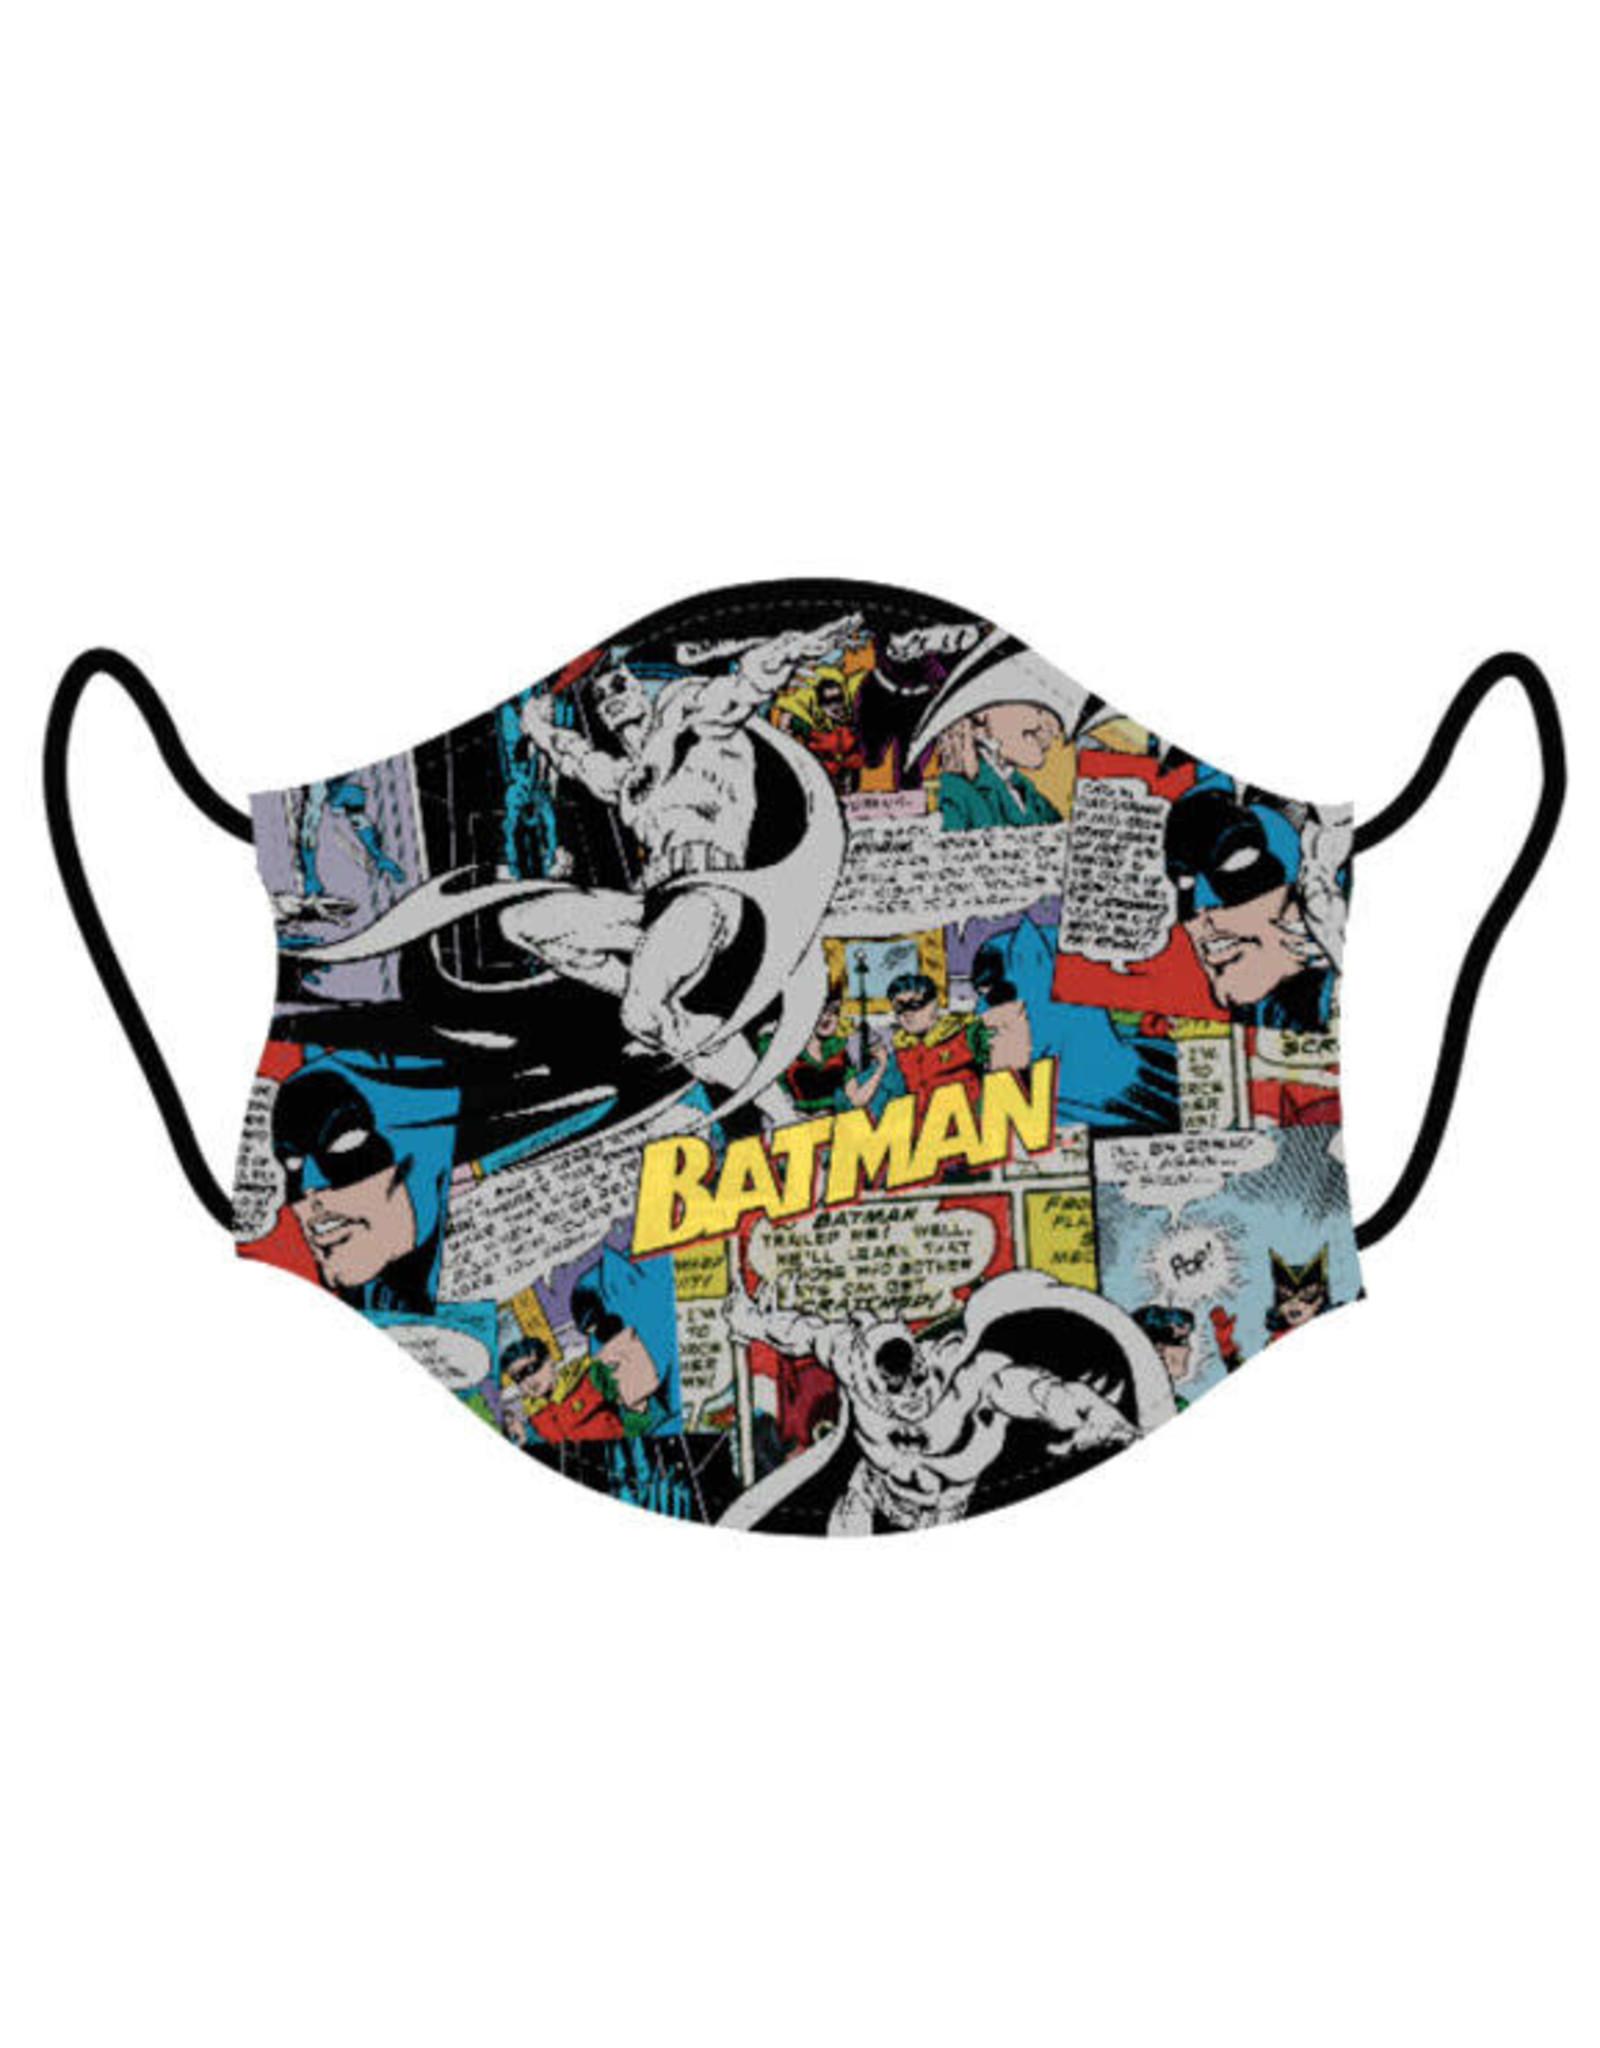 Warner Bros BATMAN Adult Face Mask M